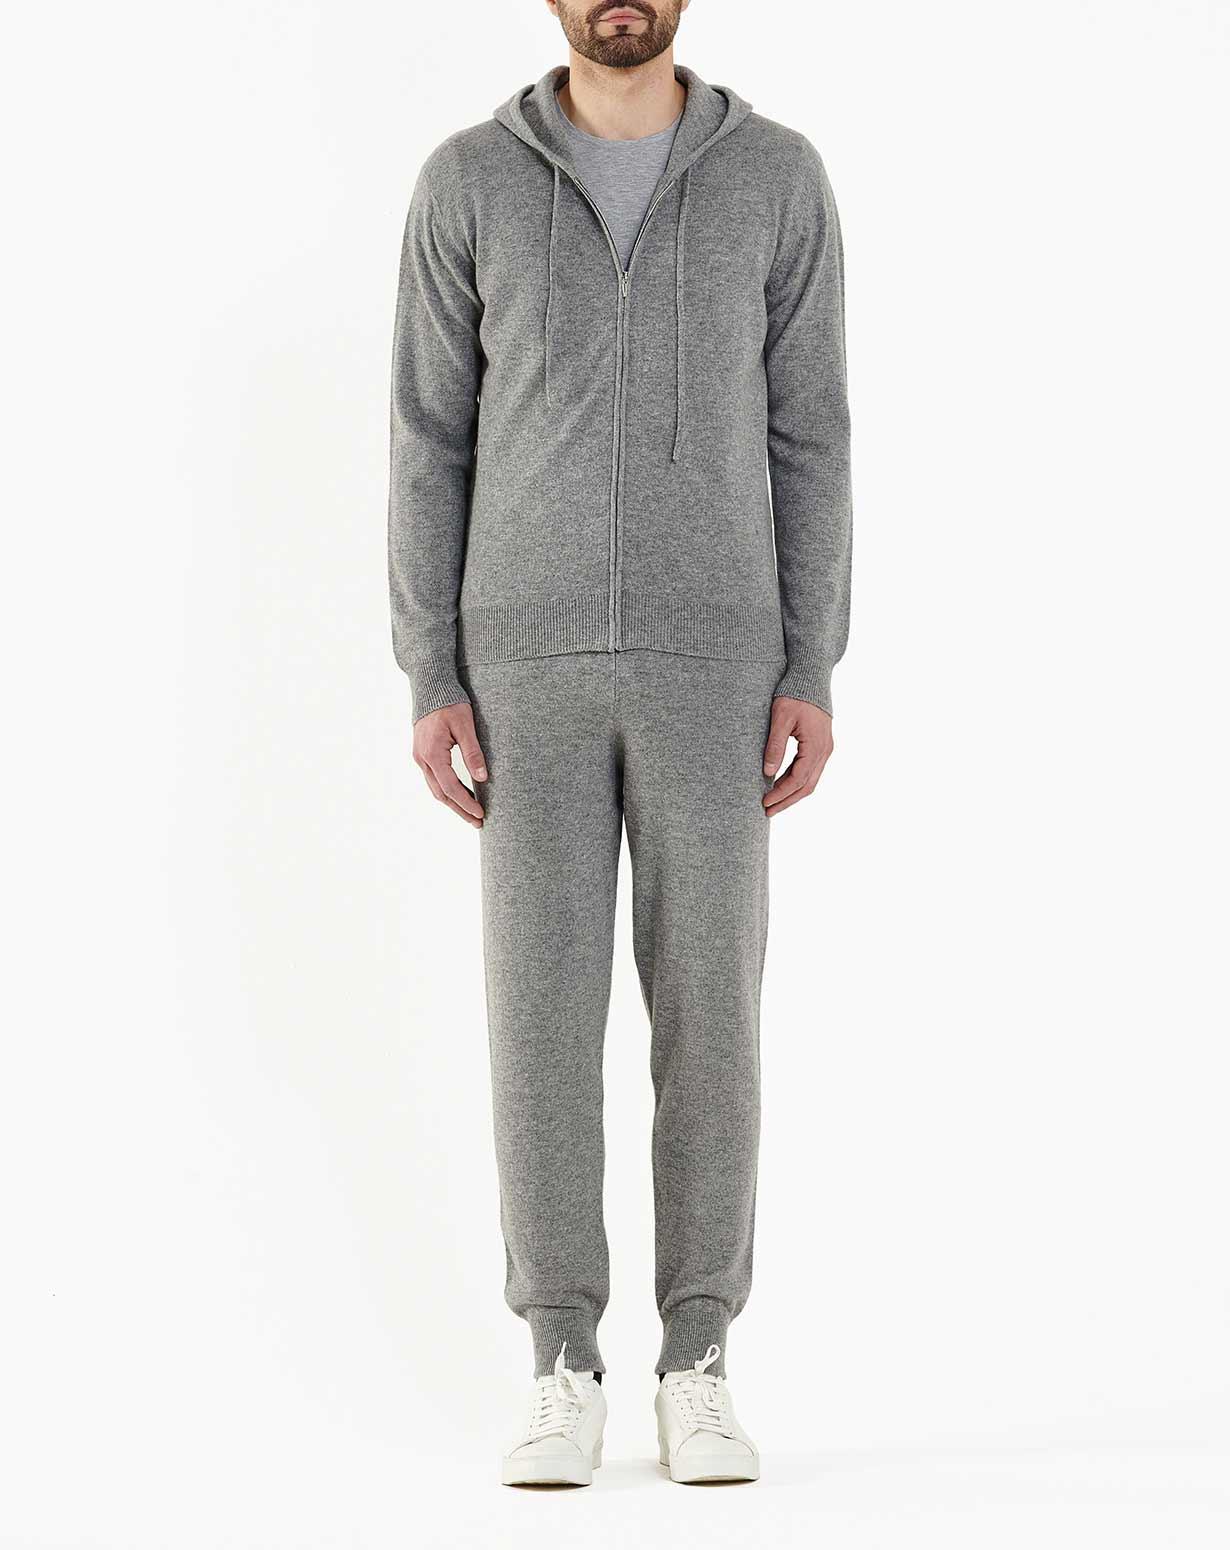 new style 448b2 c9f3c Pantalone Uomo in 100% Cashmere